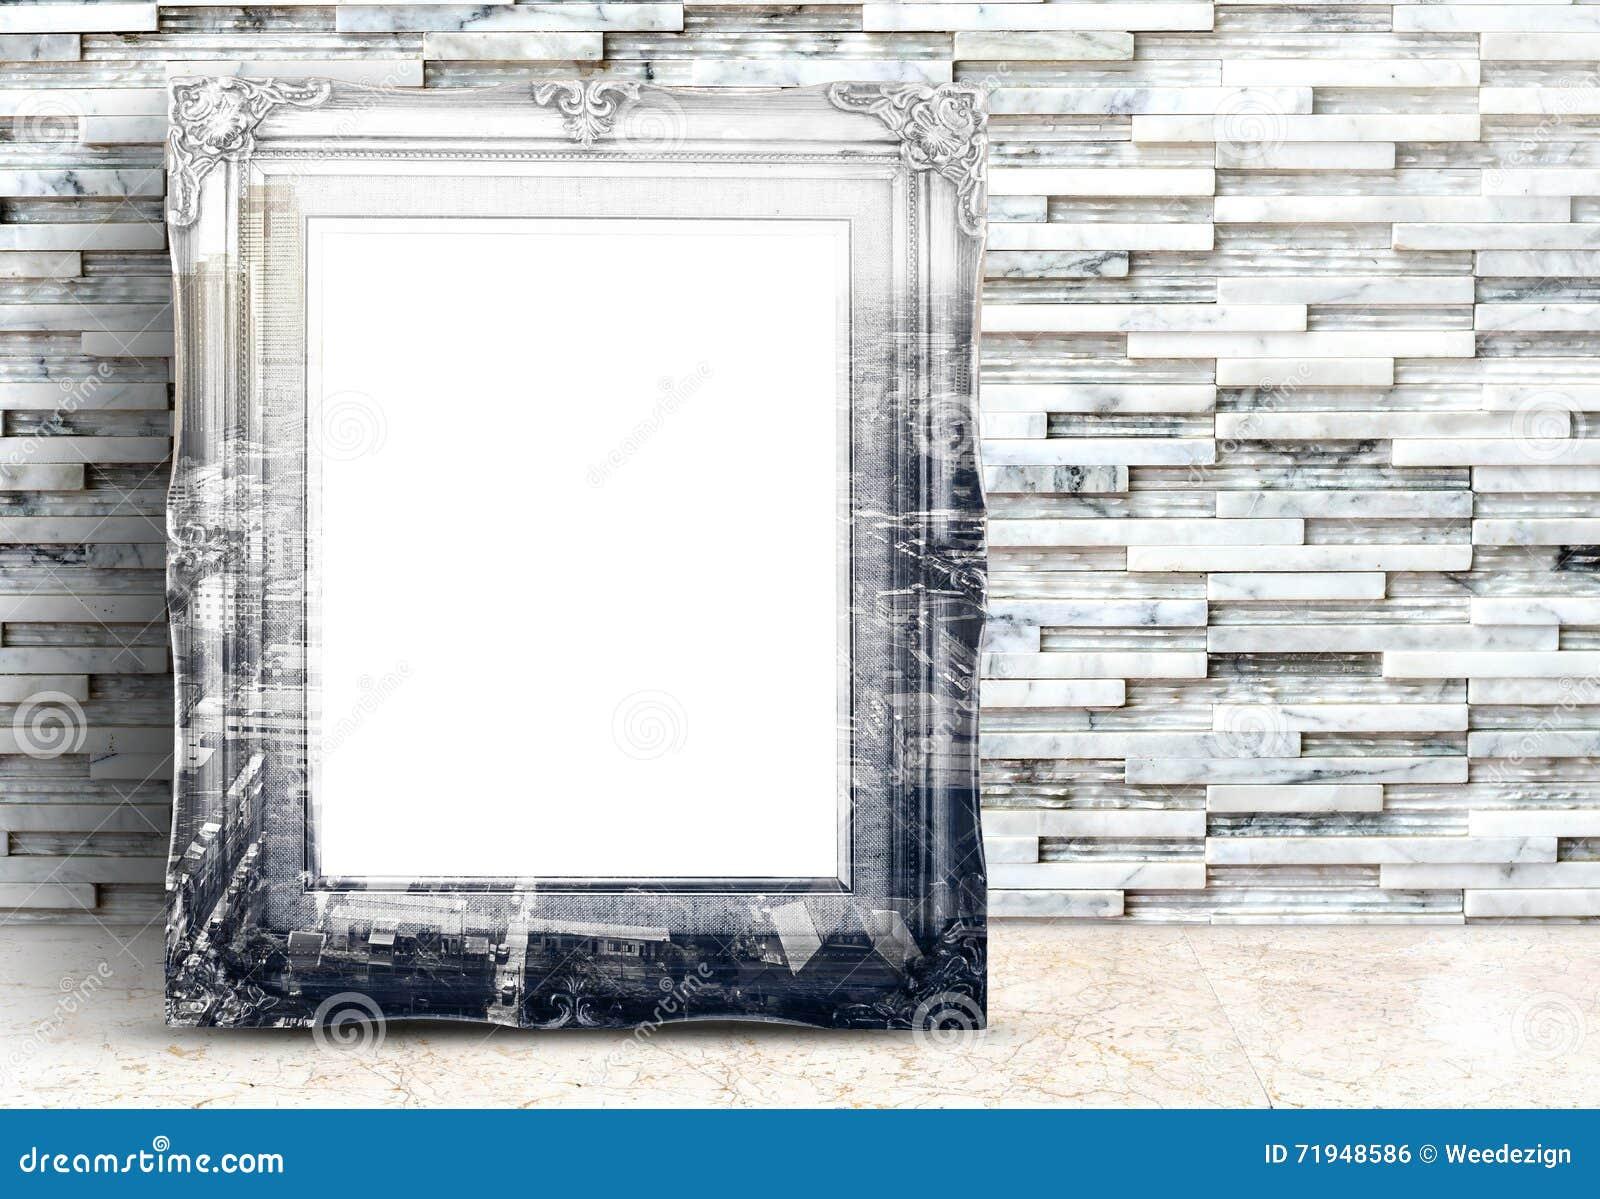 Пустое изображение города overlay на винтажной рамке на мраморном поле и